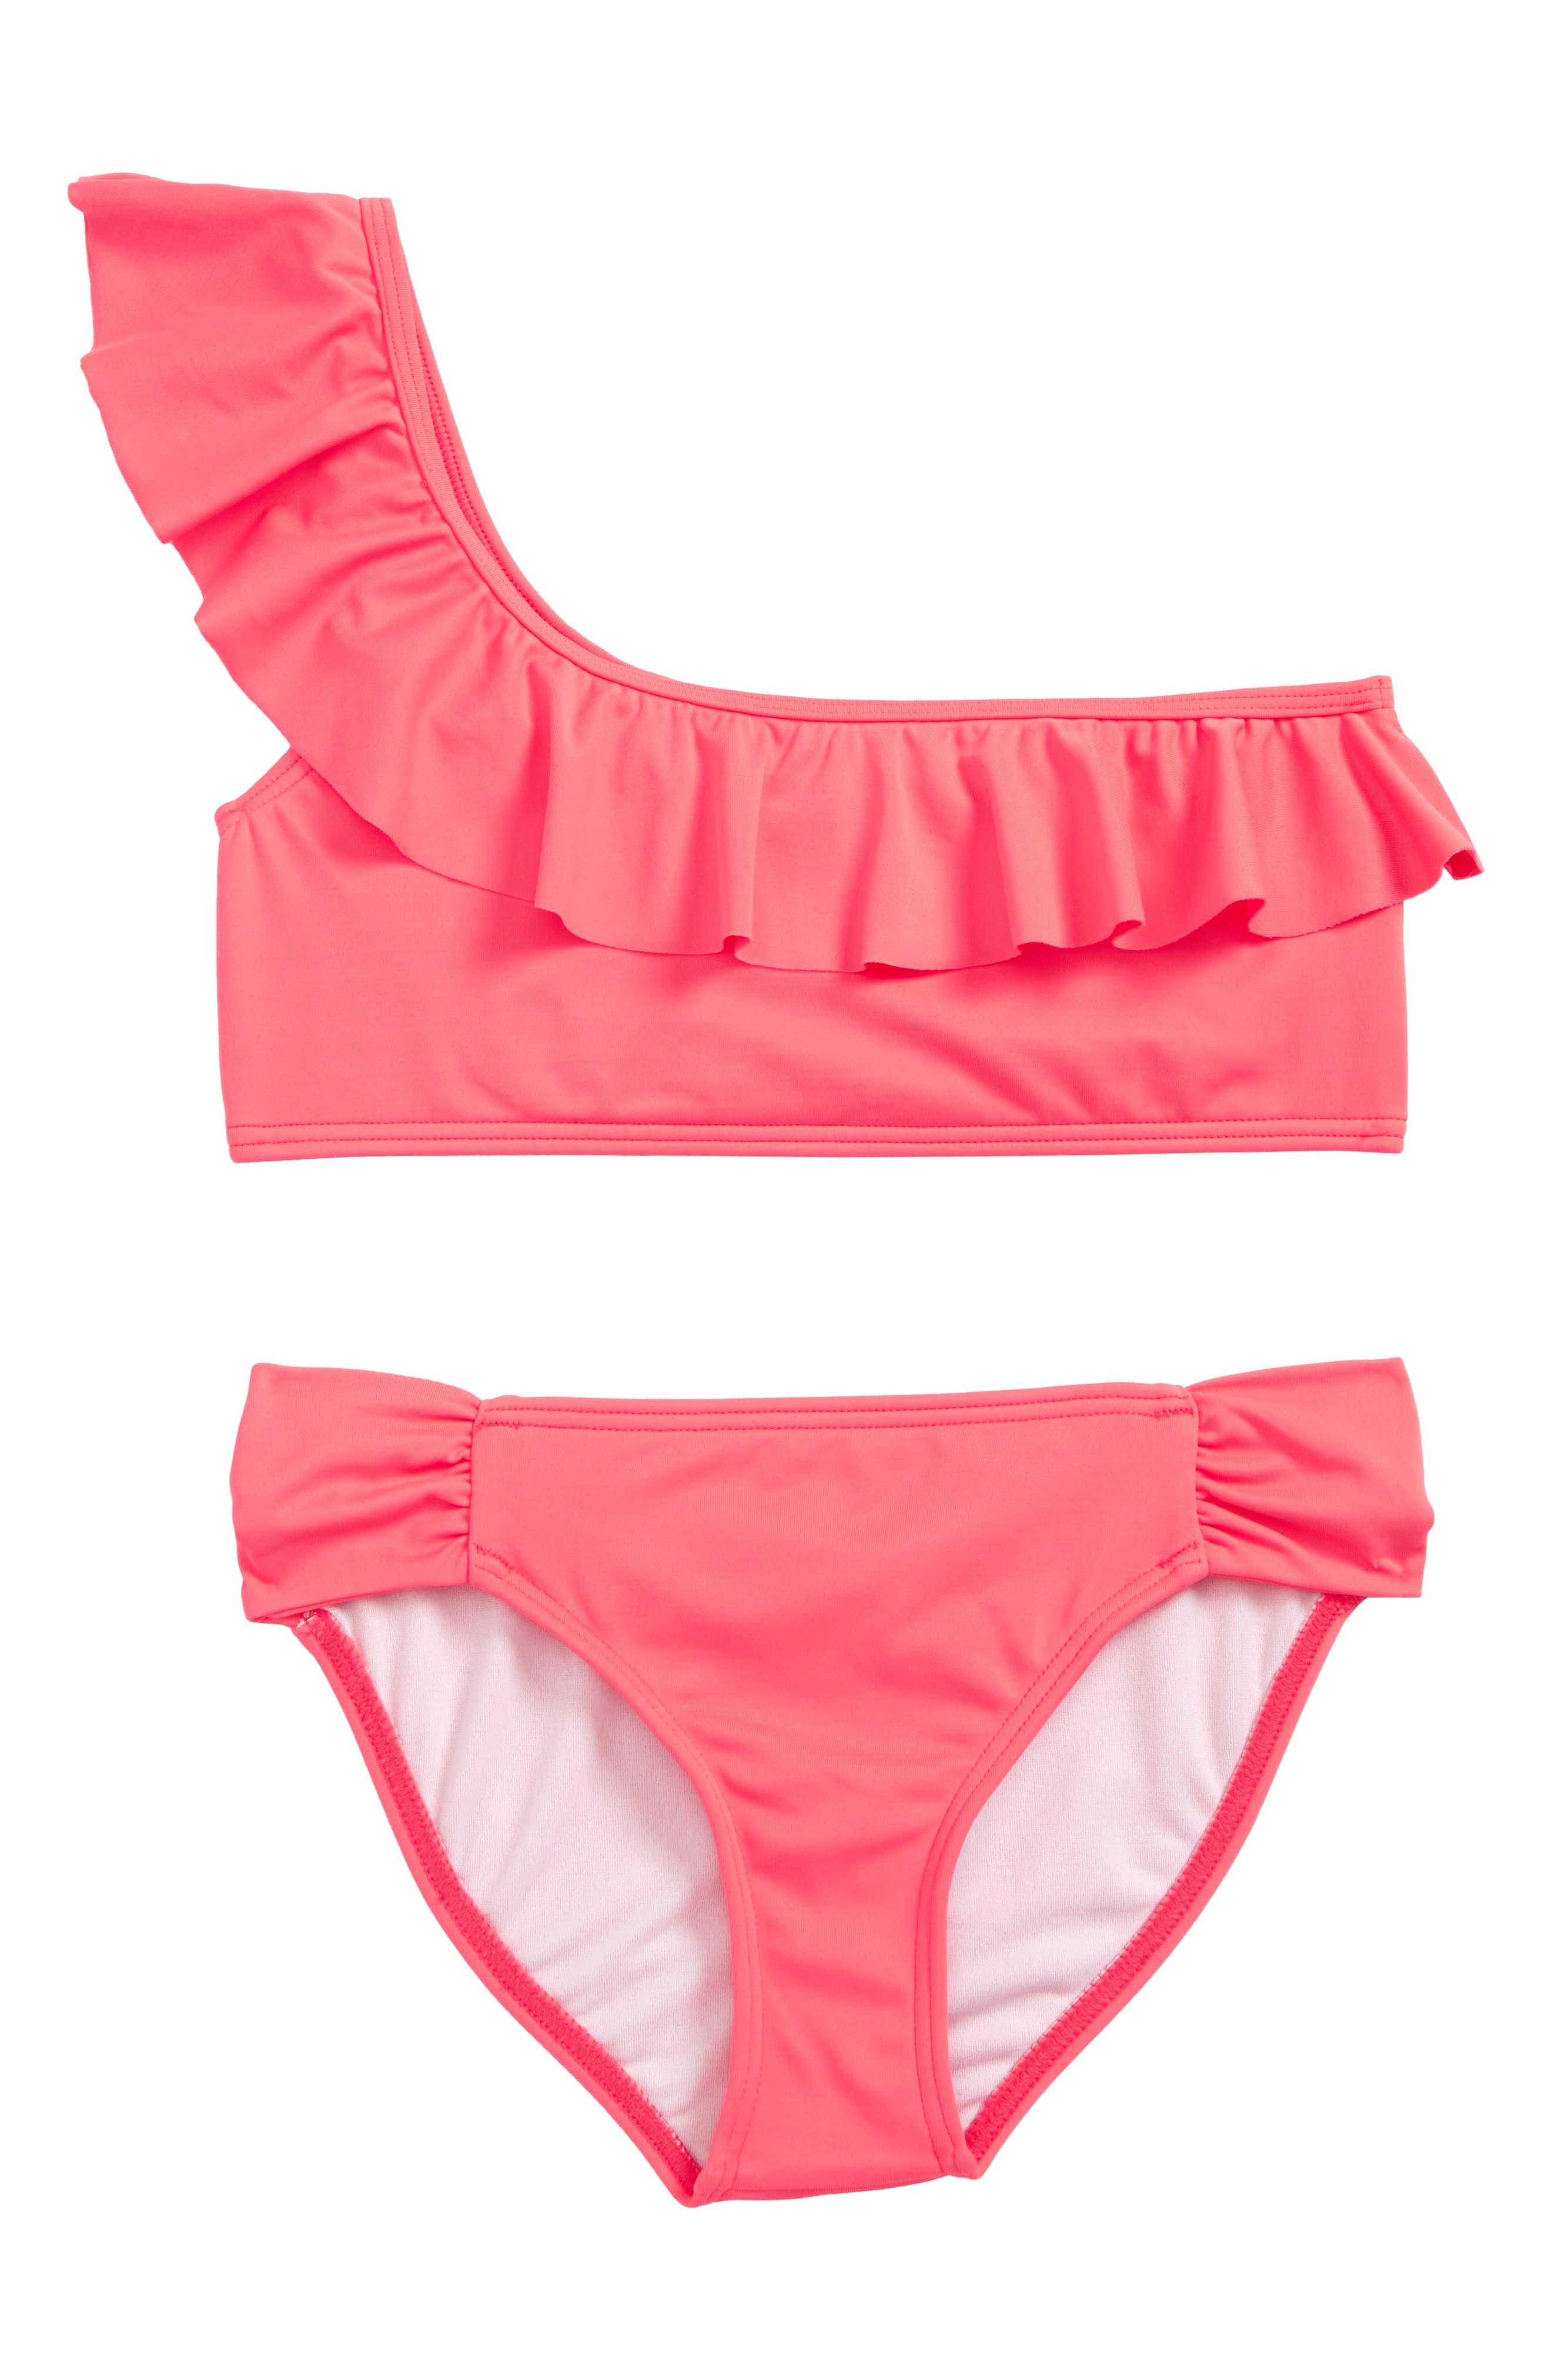 Main Image - Billabong Sol Searcher Two-Piece Swimsuit (Little Girls & Big Girls)